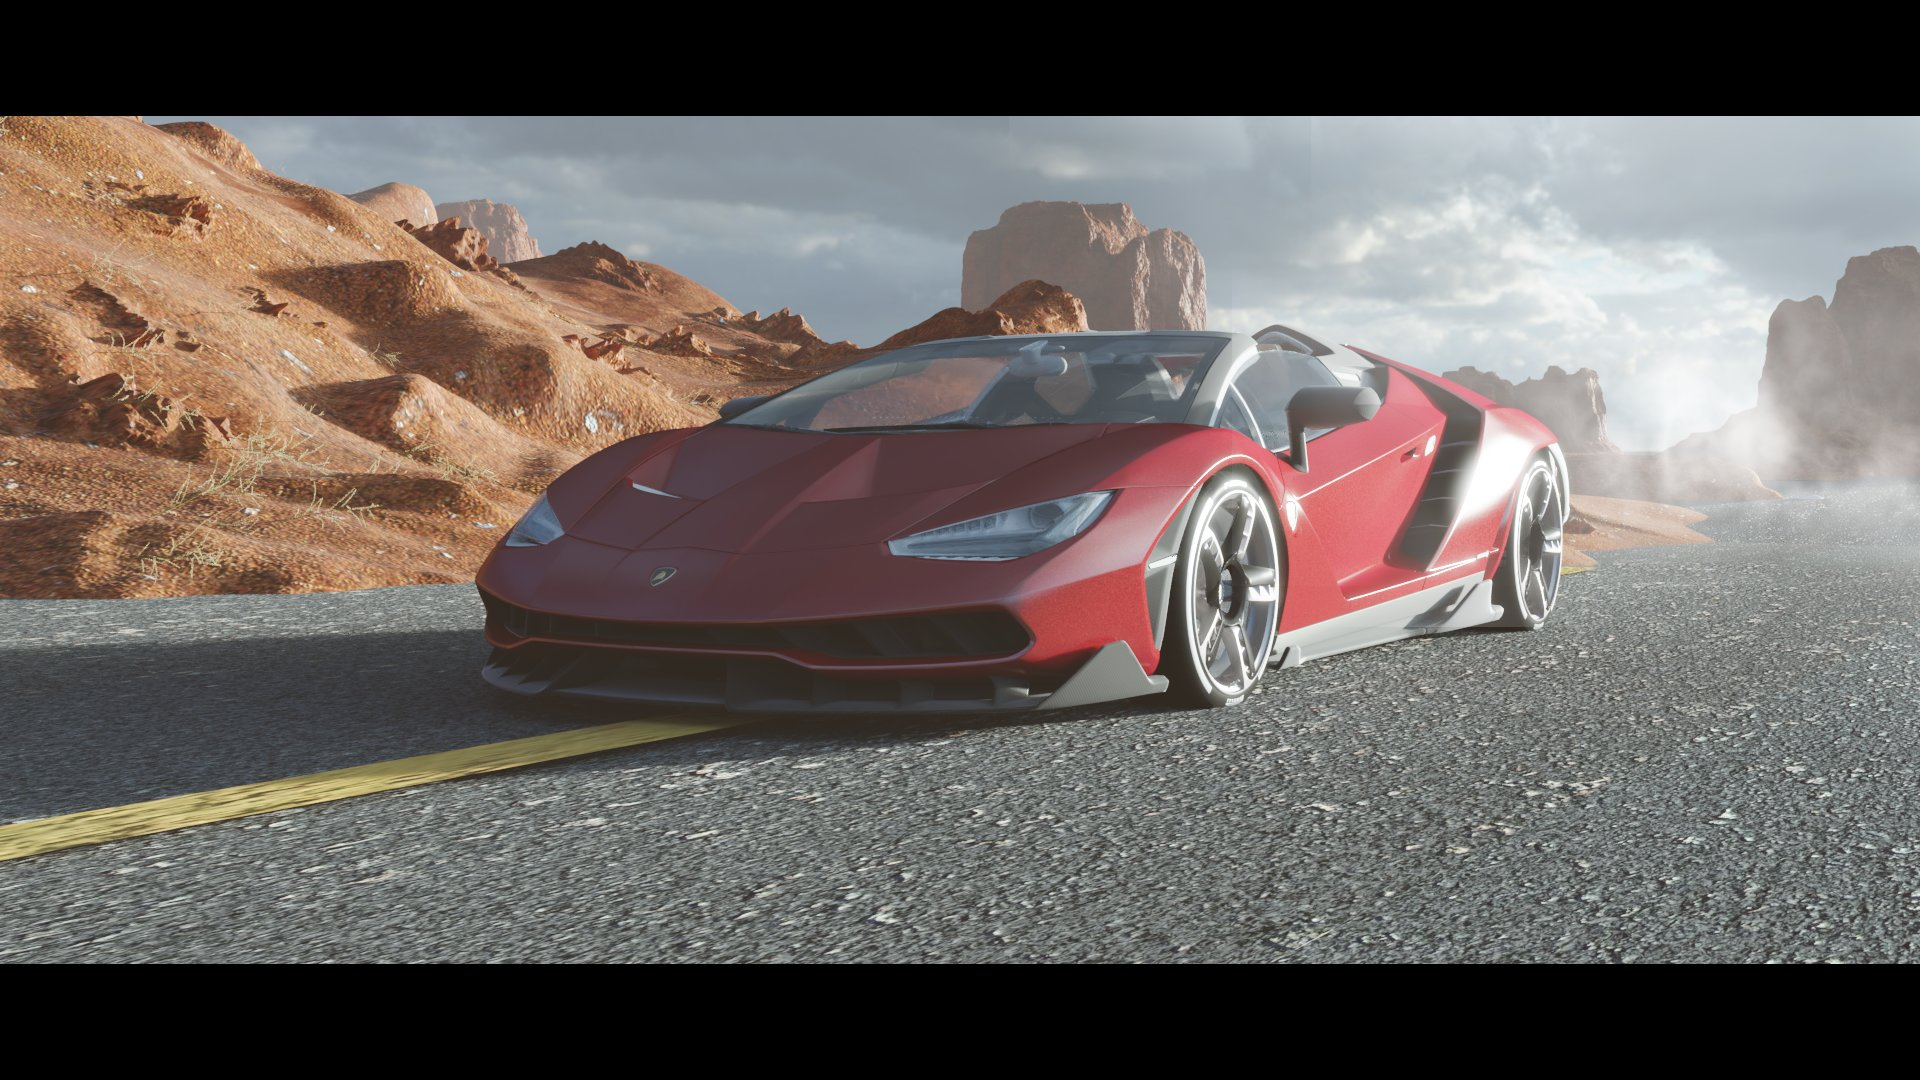 Desert's Lamborghini 3d art